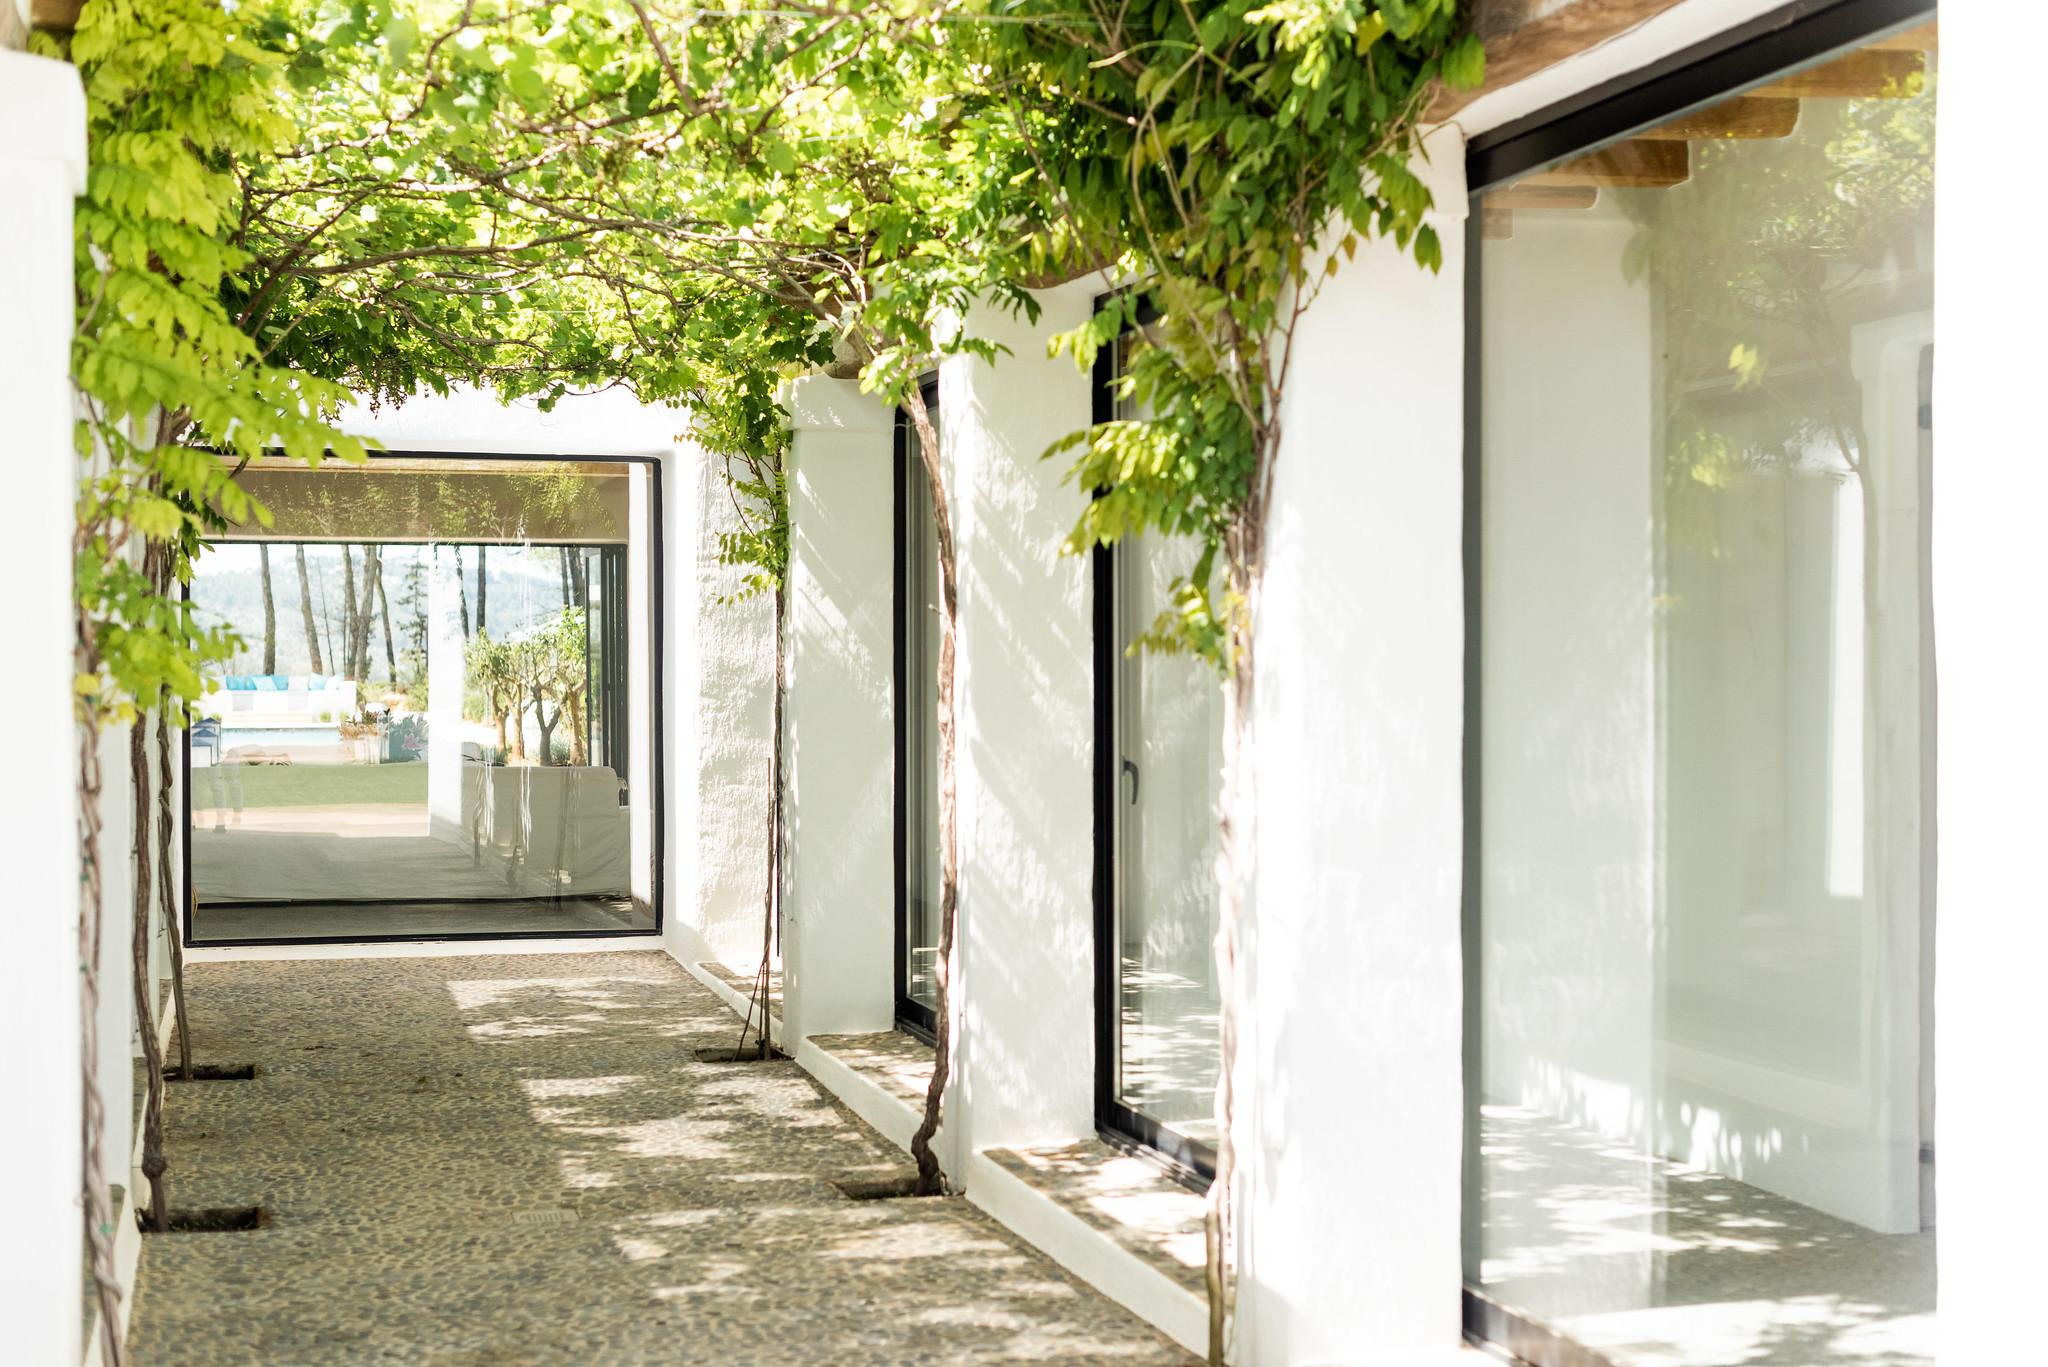 https://www.white-ibiza.com/wp-content/uploads/2020/05/white-ibiza-villas-can-terra-central-atrium.jpg